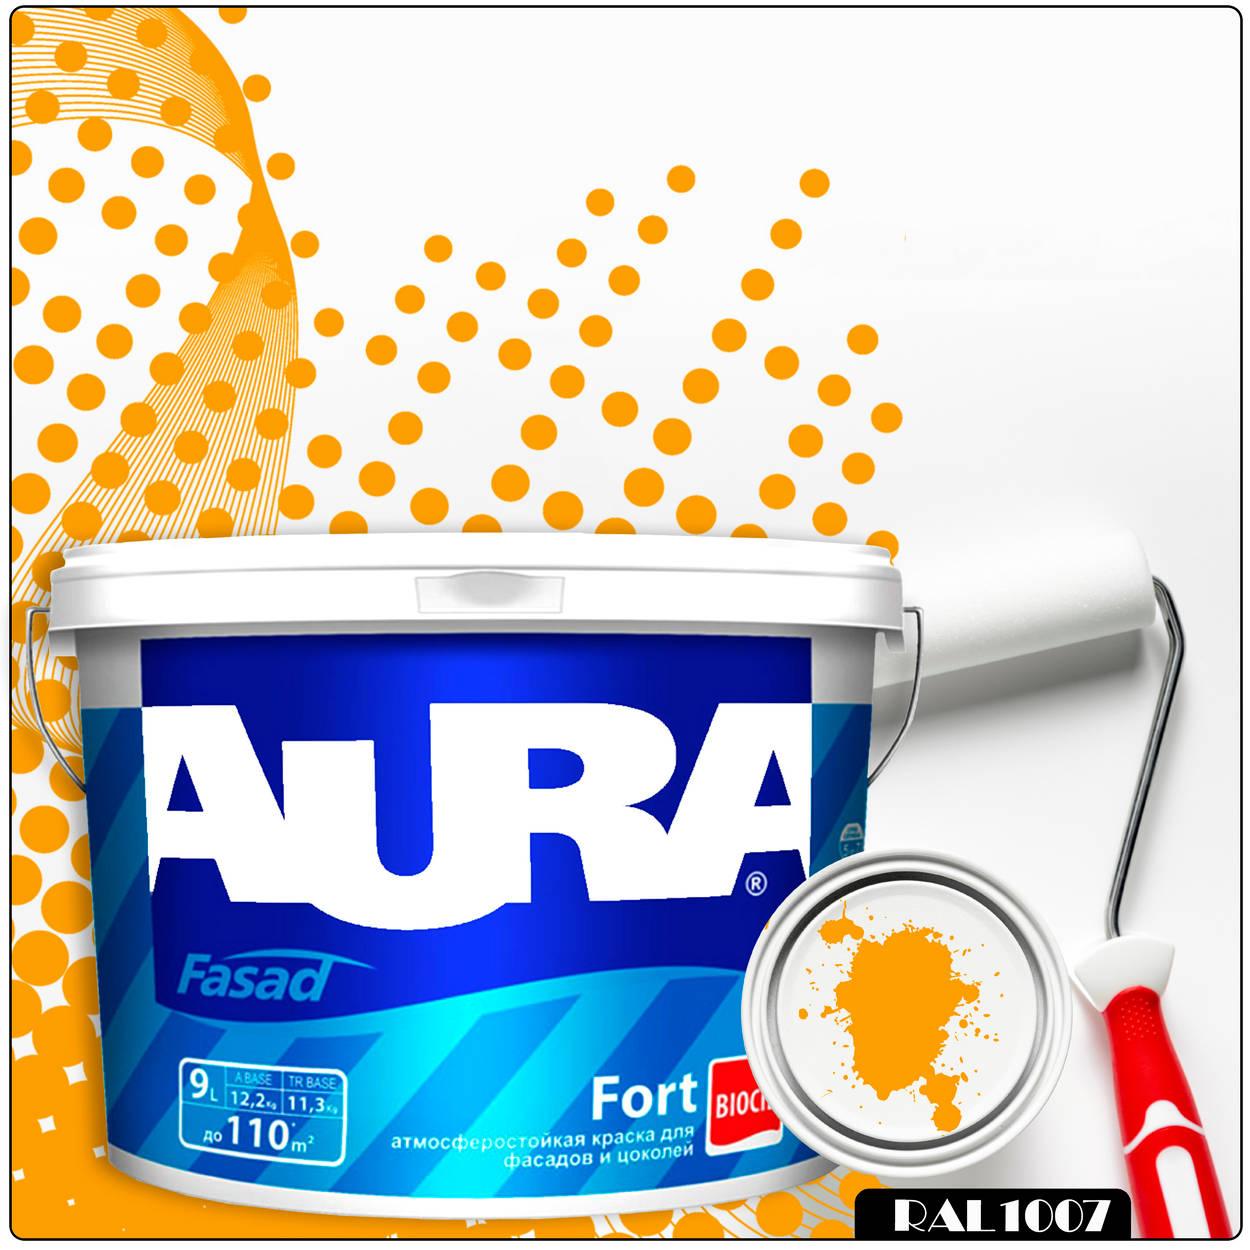 Фото 8 - Краска Aura Fasad Fort, RAL 1007 Нарциссово-жёлтый, латексная, матовая, для фасада и цоколей, 9л, Аура.